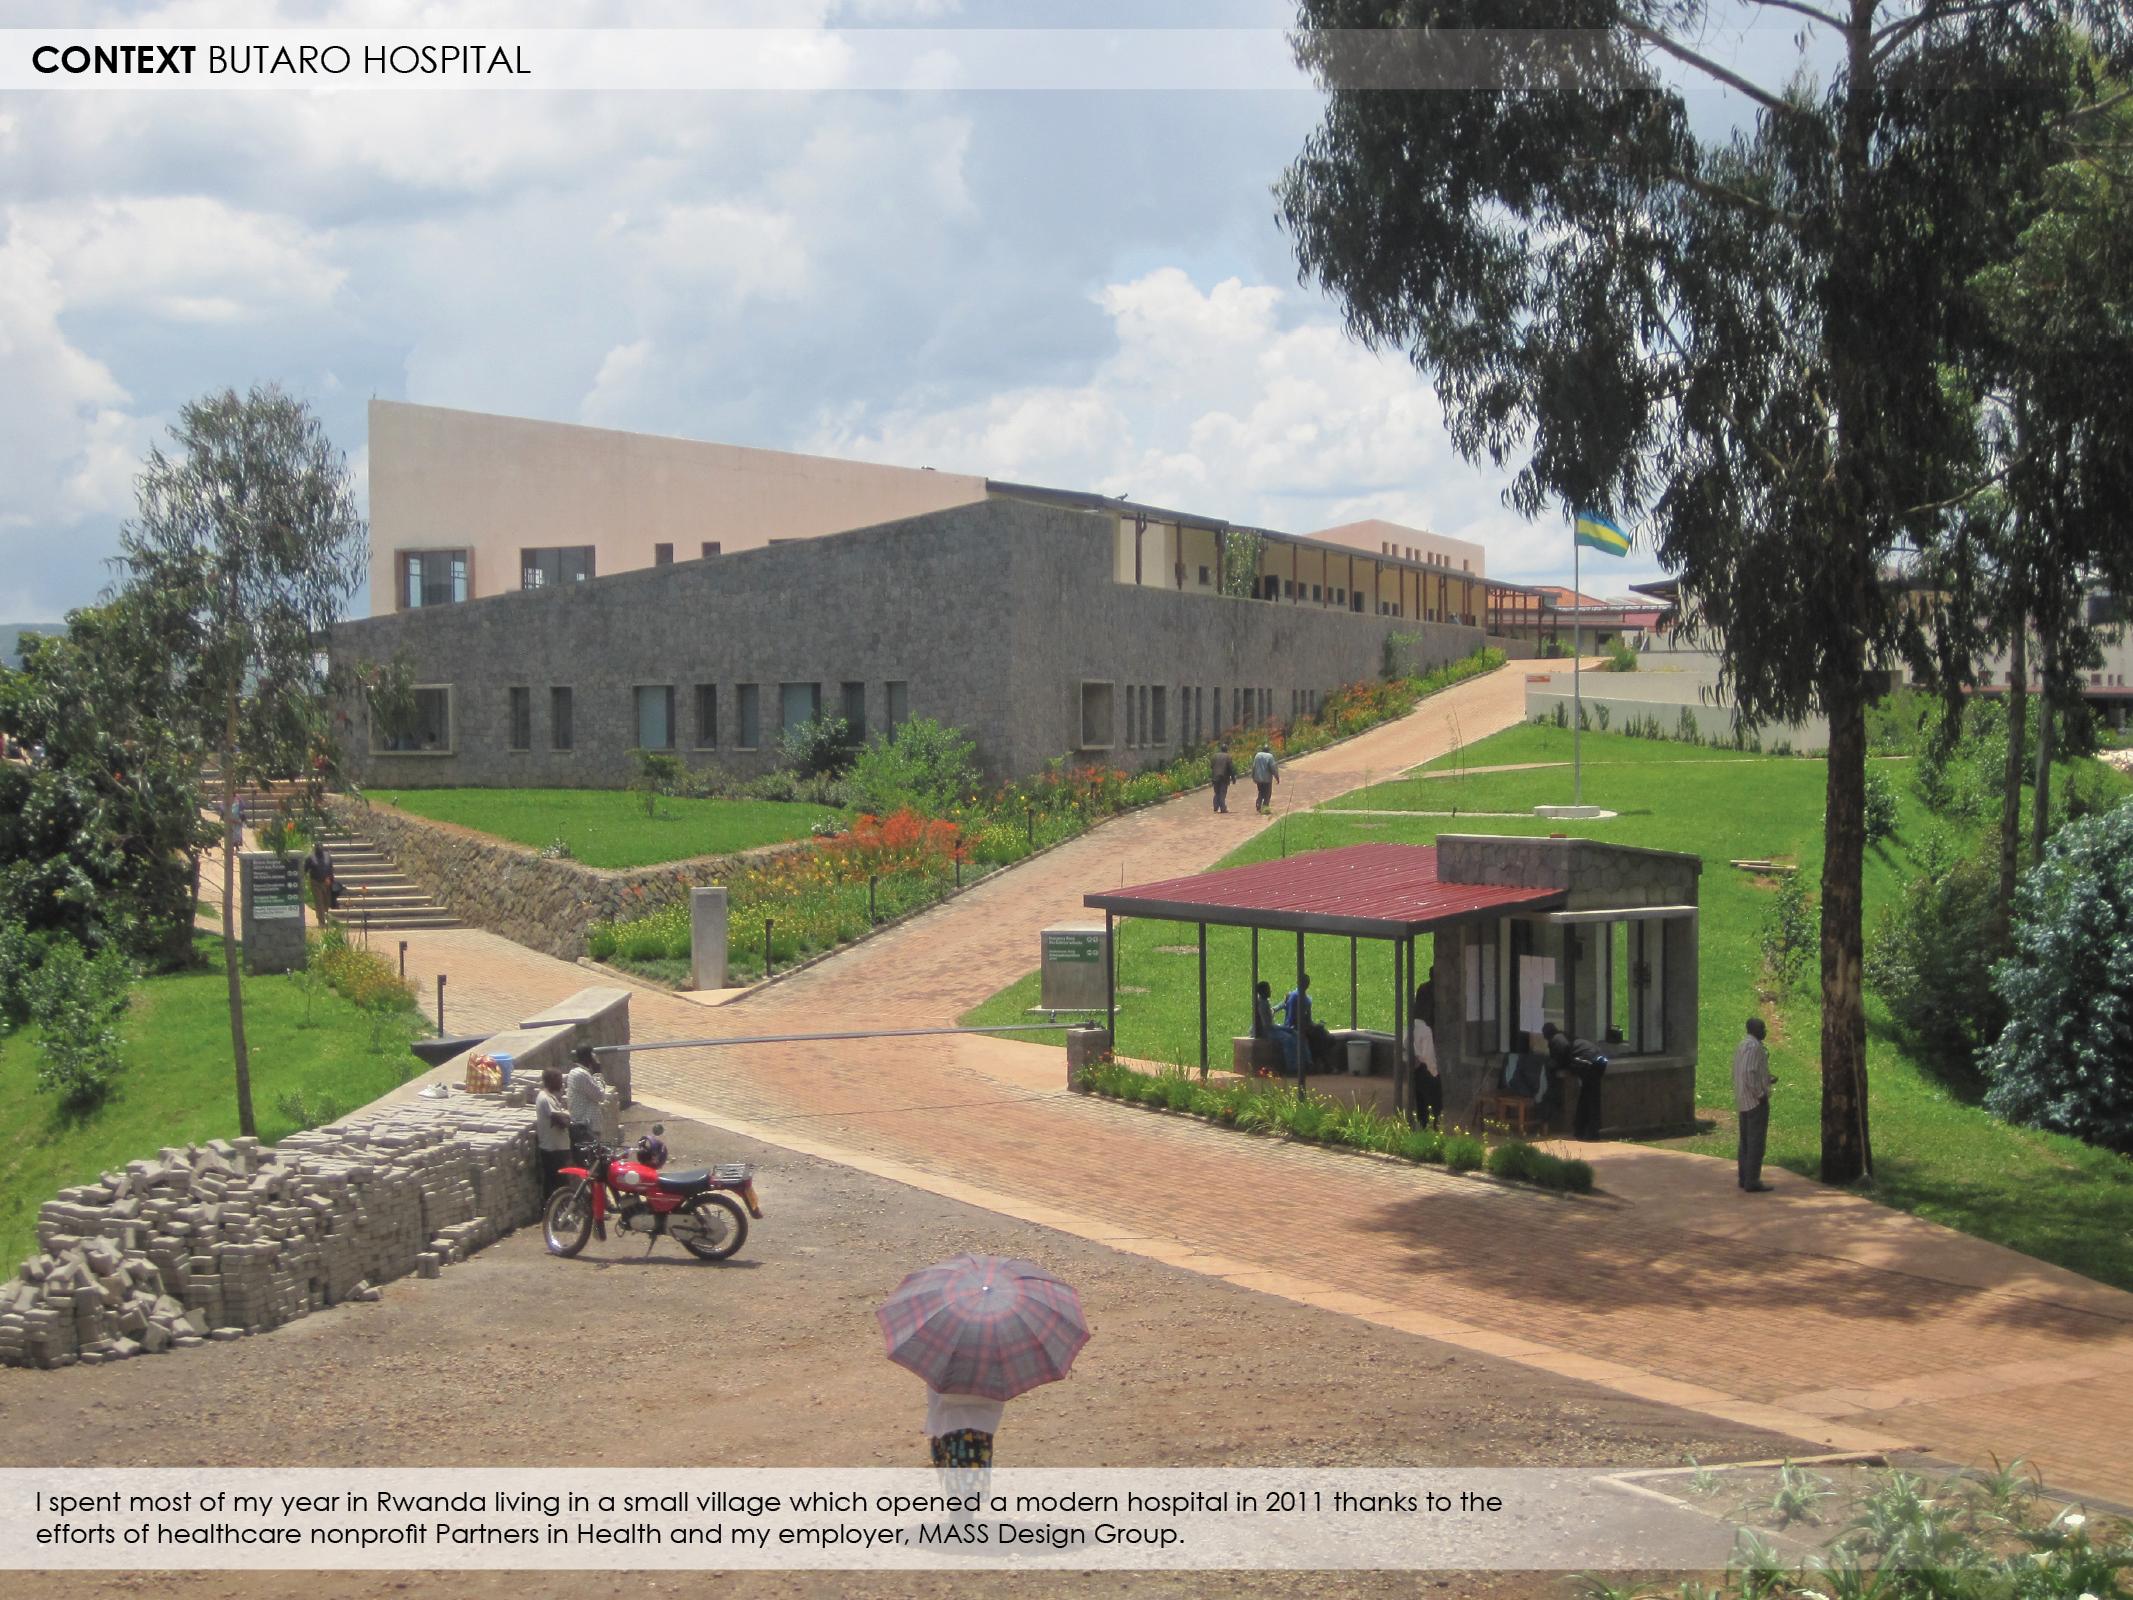 Gaugler_RwandaExperience_p2.jpg